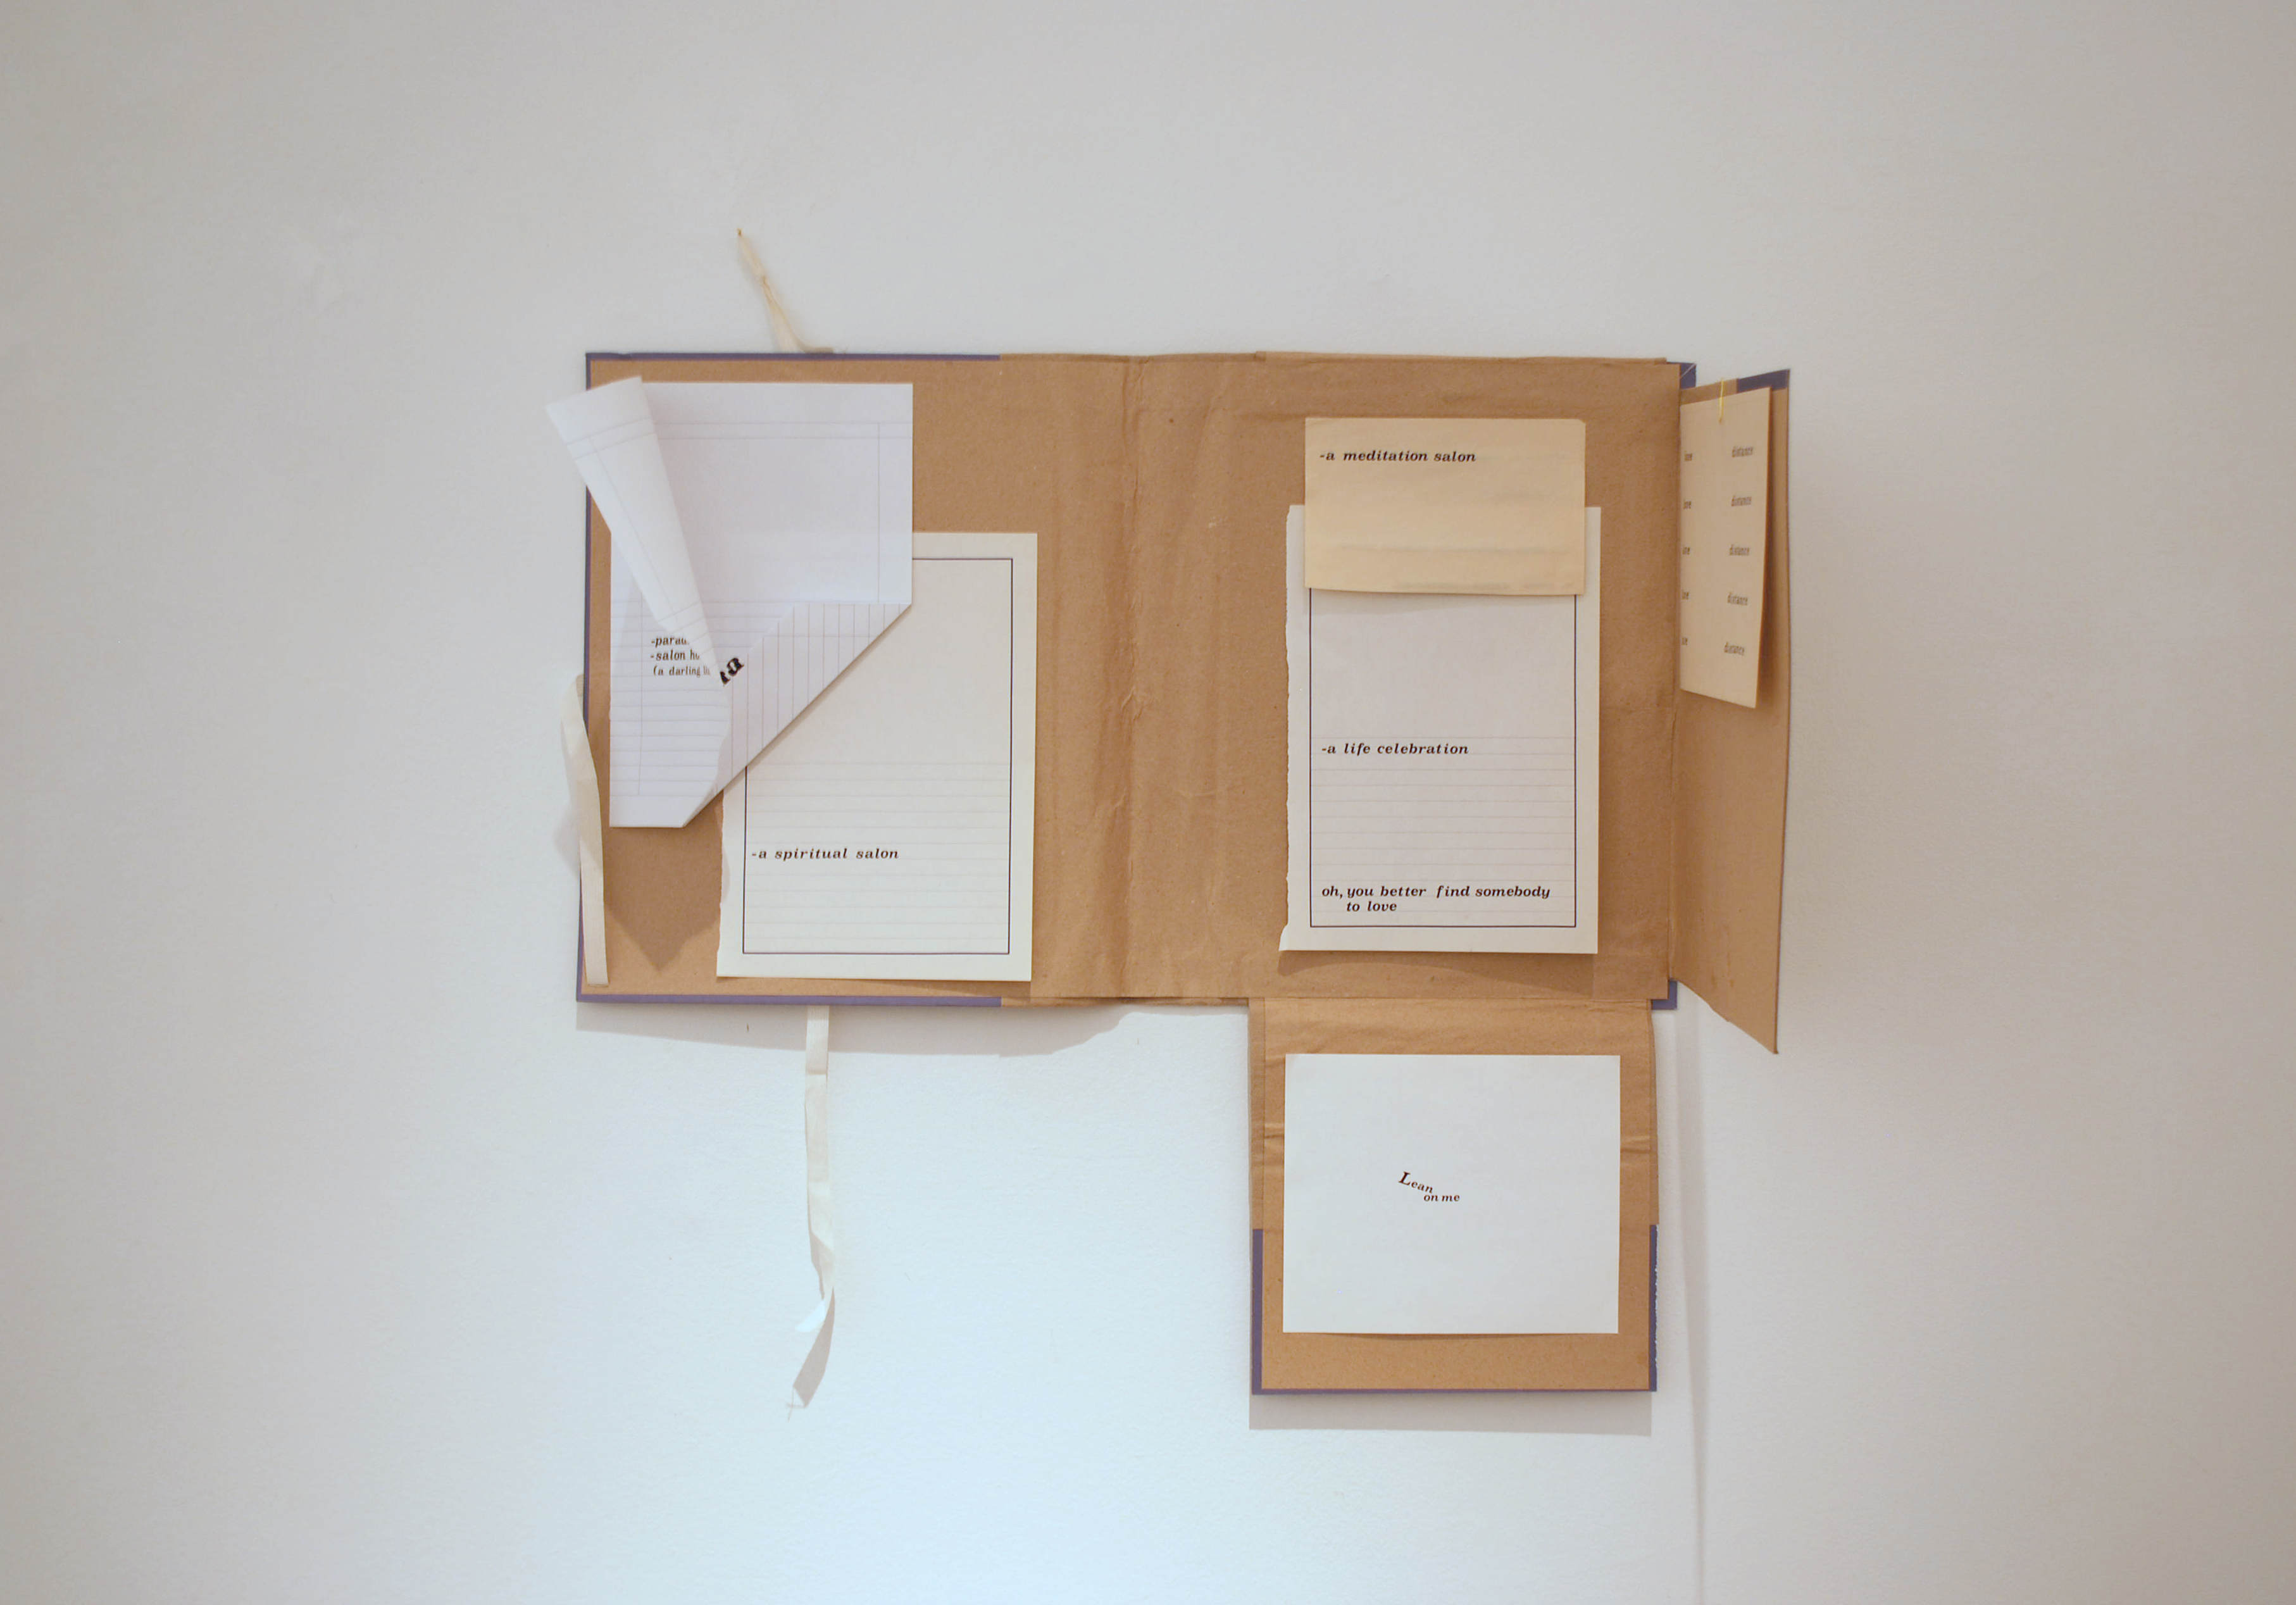 Dimitra Vamiali The Fine Qualities of Distressed Paper Ileana Tounta Contemporary Art Center Exhibitions